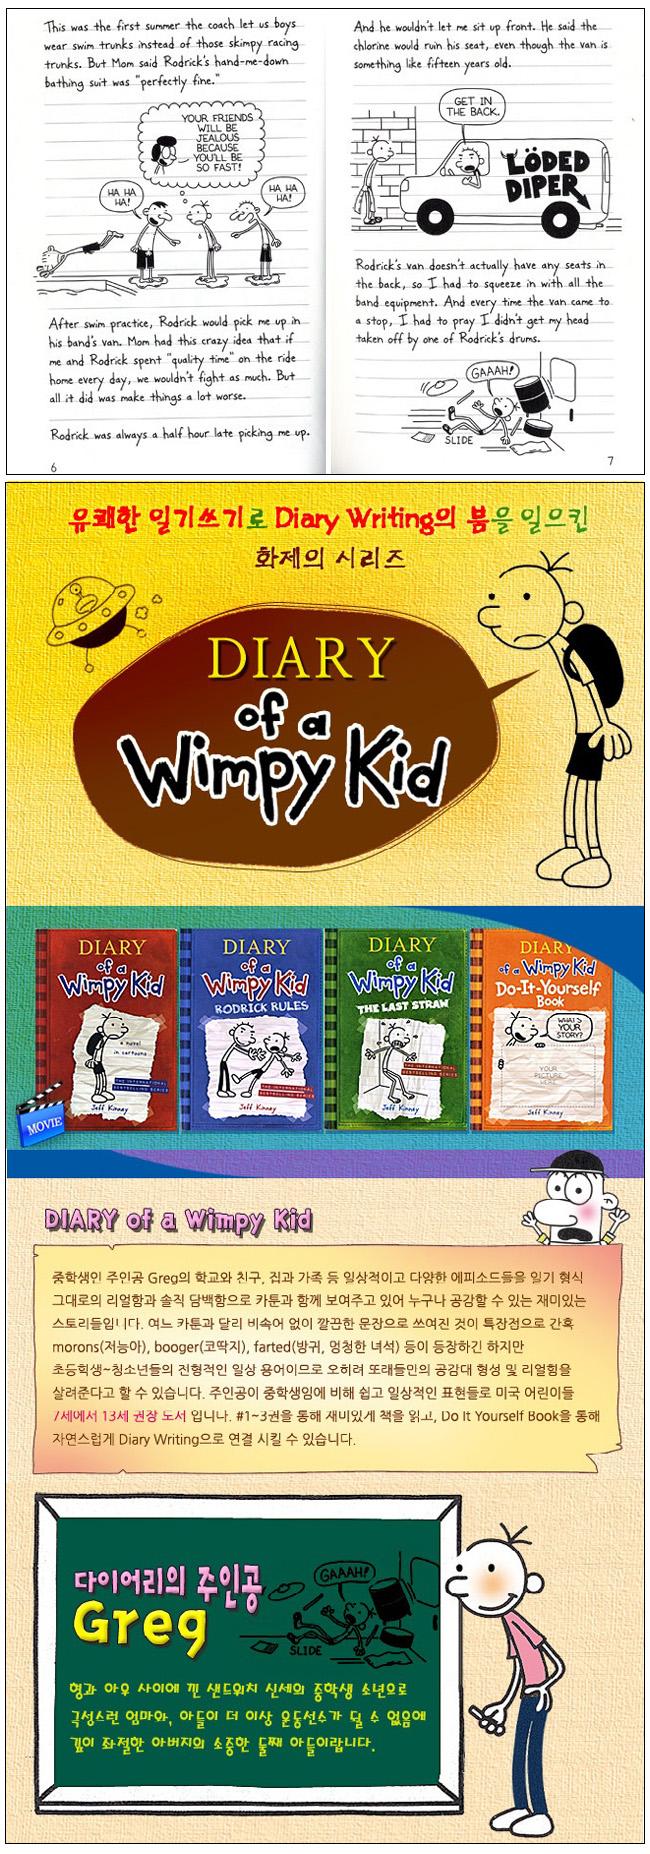 Diary of a Wimpy Kid #2: Rodrick Rules 도서 상세이미지